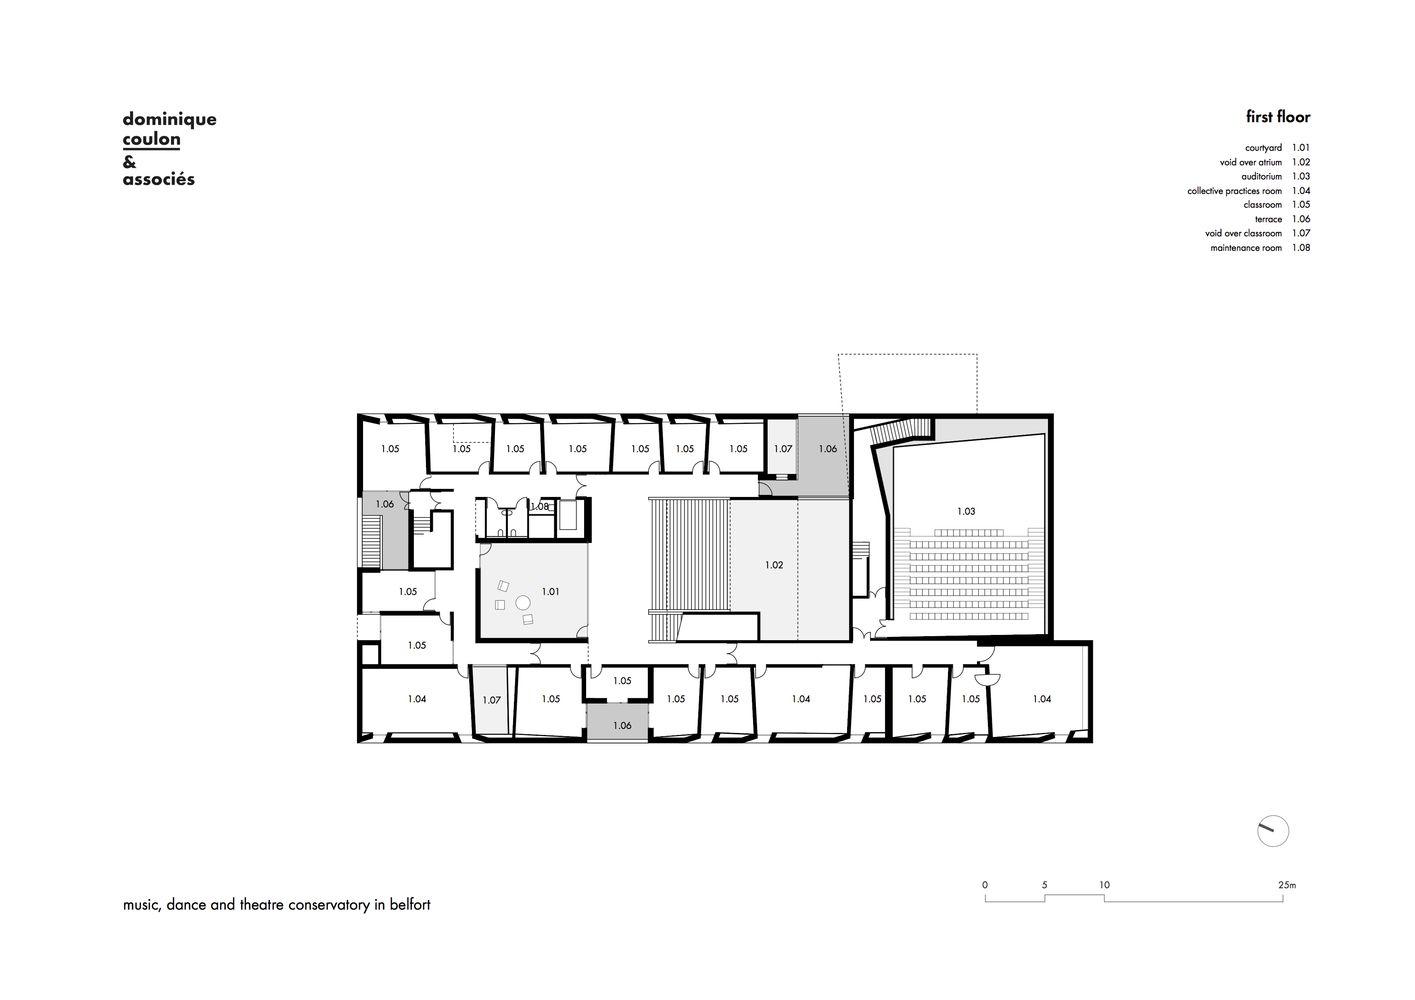 Gallery Of Henri Dutilleux Conservatoire Dominique Coulon Associes 38 Dramatic Arts Music School Conservatory